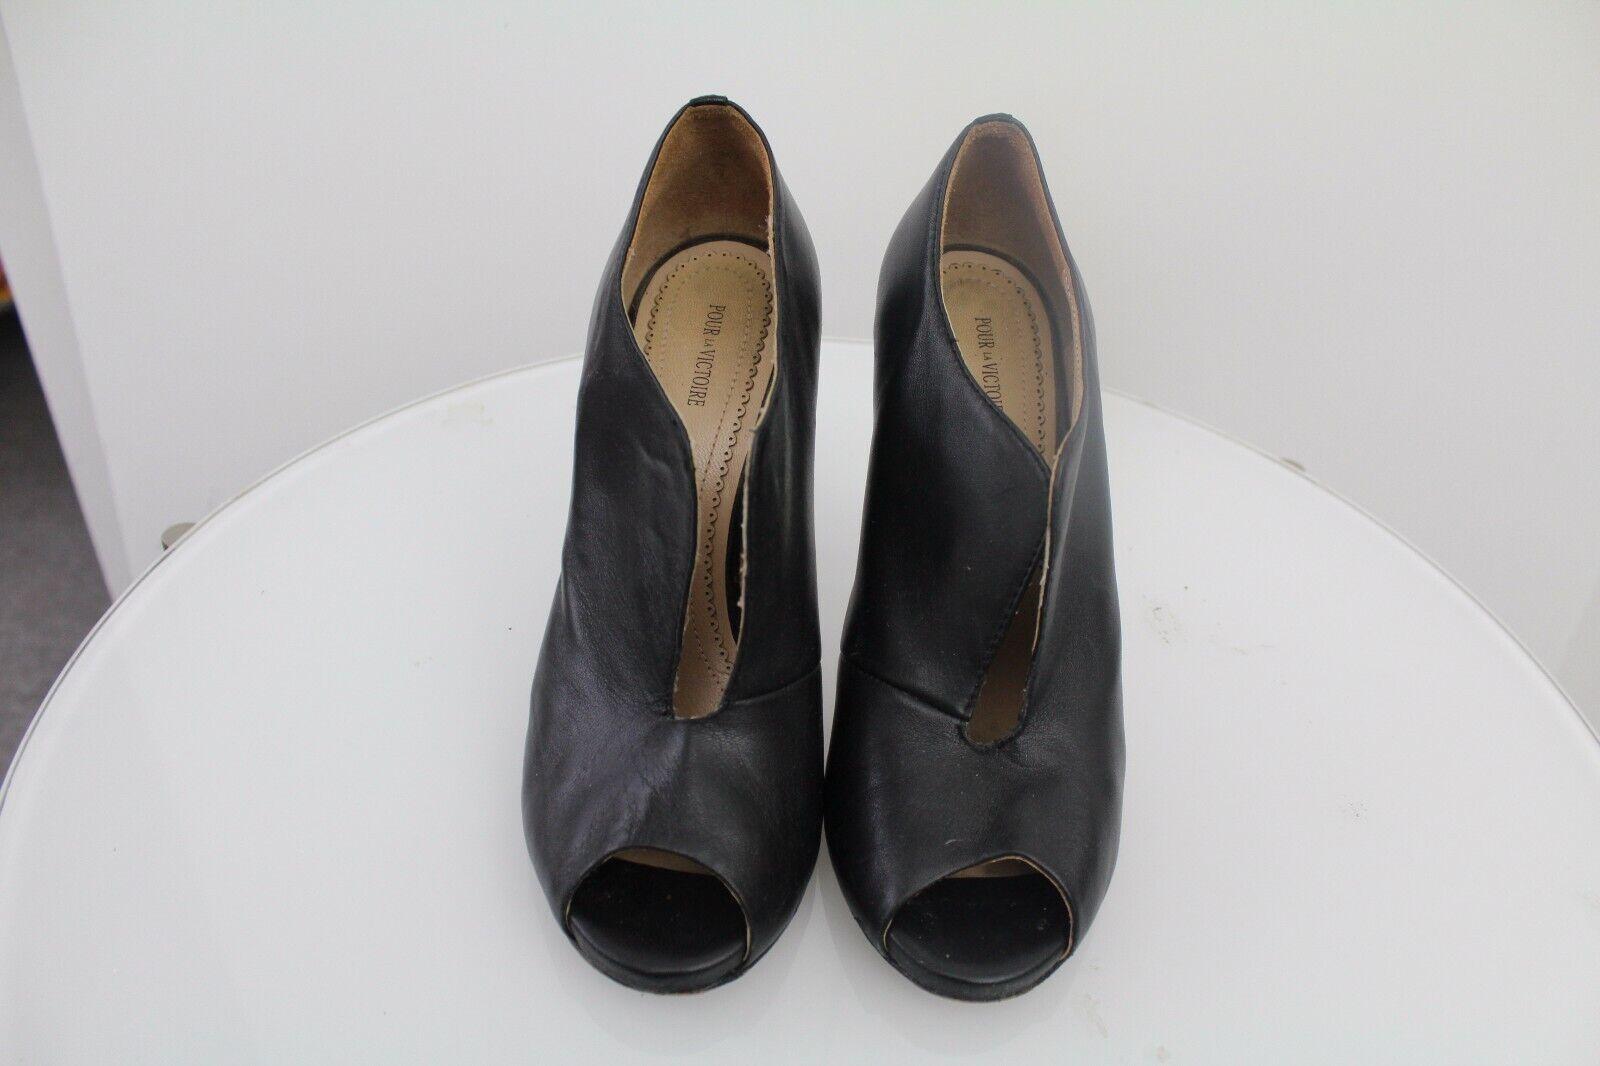 Pour la Victoire Vivie Vivie Vivie Black Leather Vamp Peep Toe gold Heel Booties 7.5 2f71e0